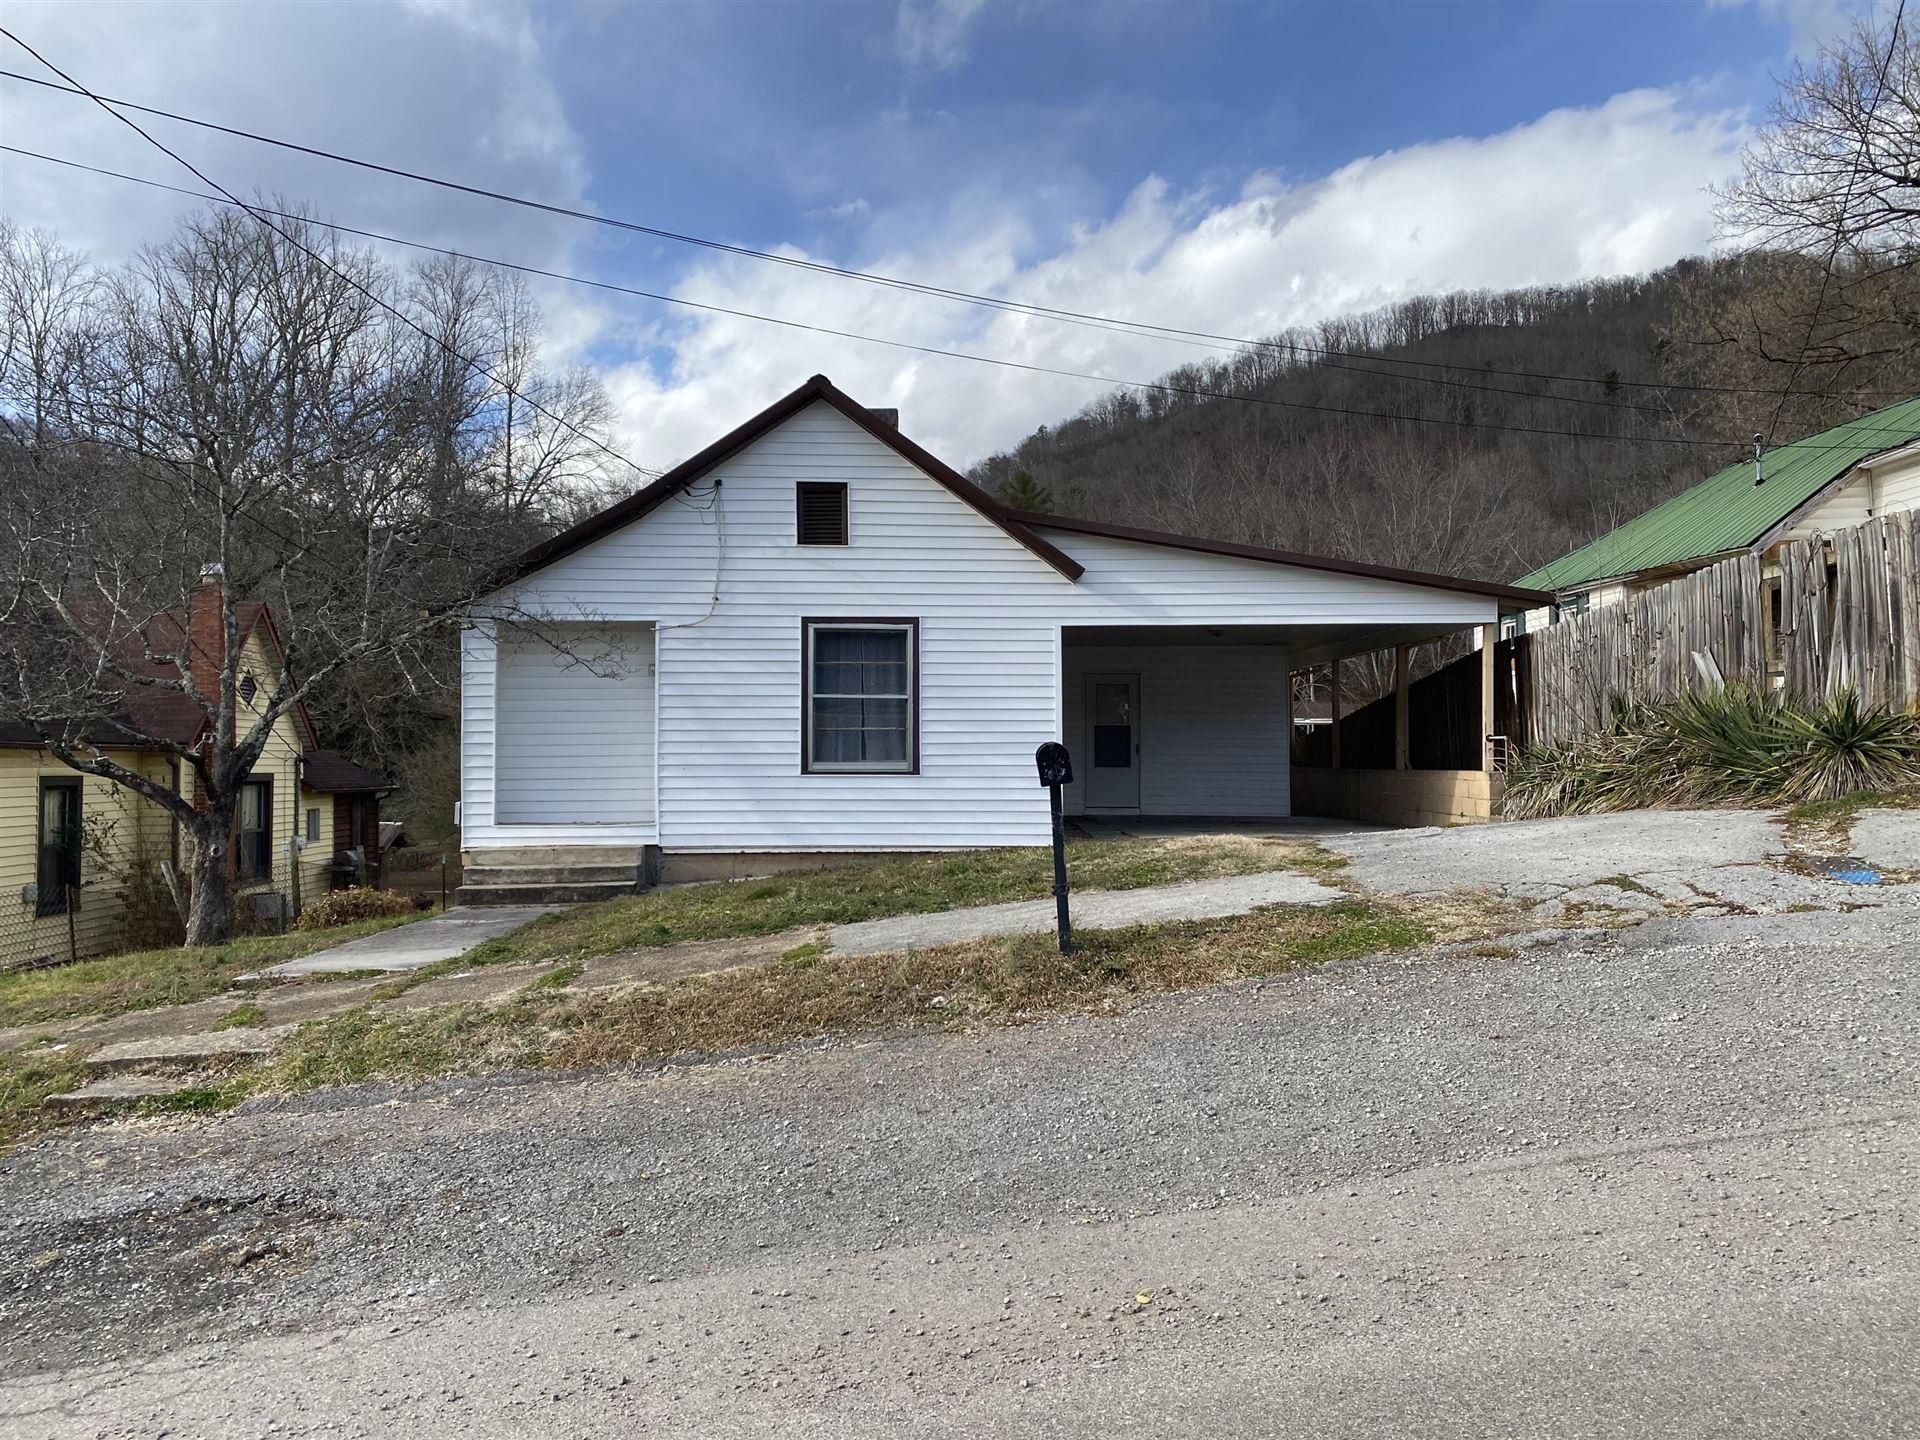 Photo of 503 E Prospect St, LaFollette, TN 37766 (MLS # 1140184)